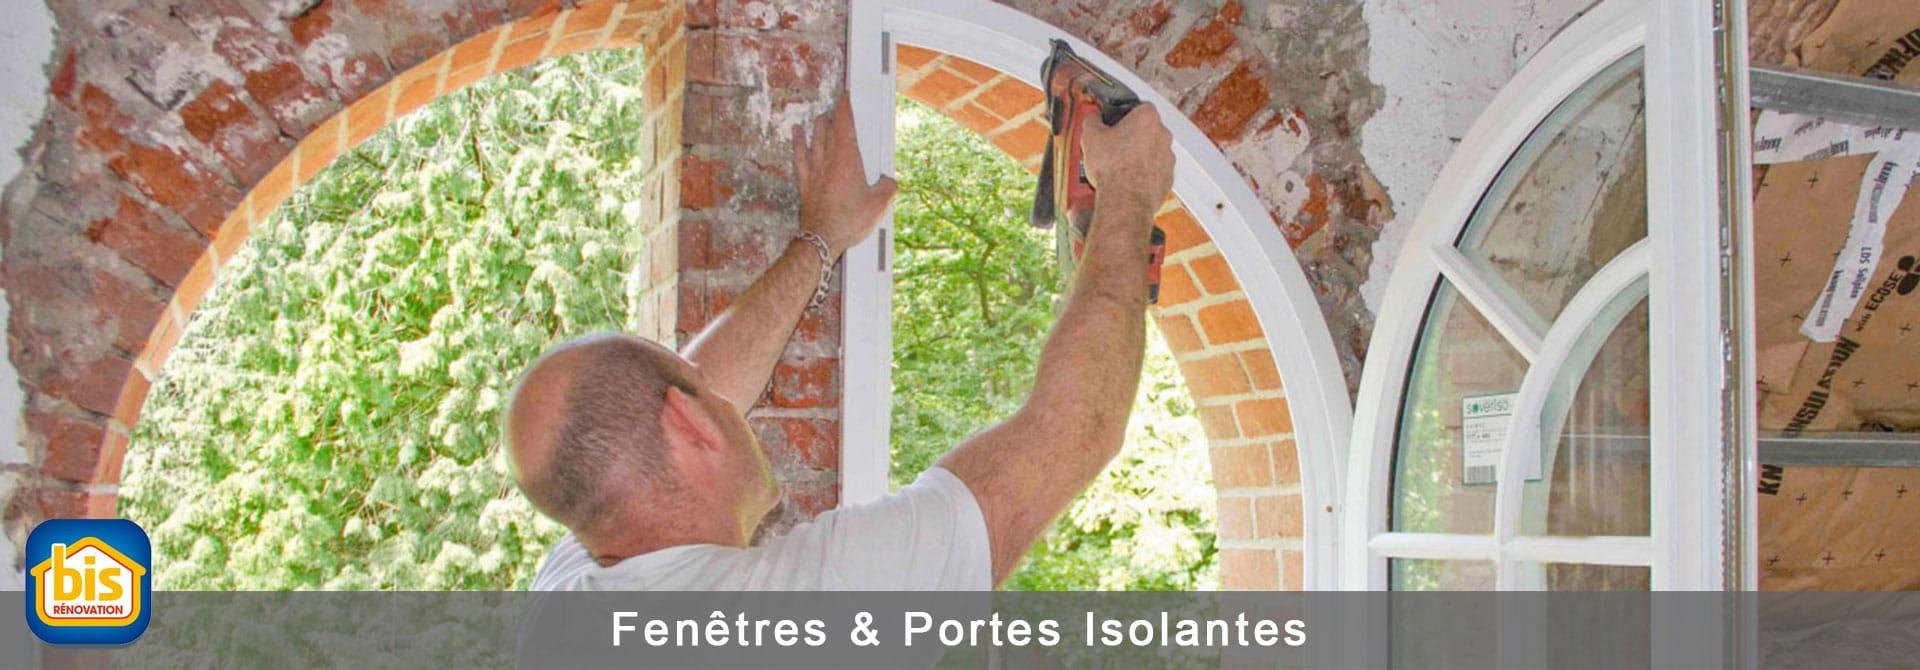 fenetre_porte_isolante